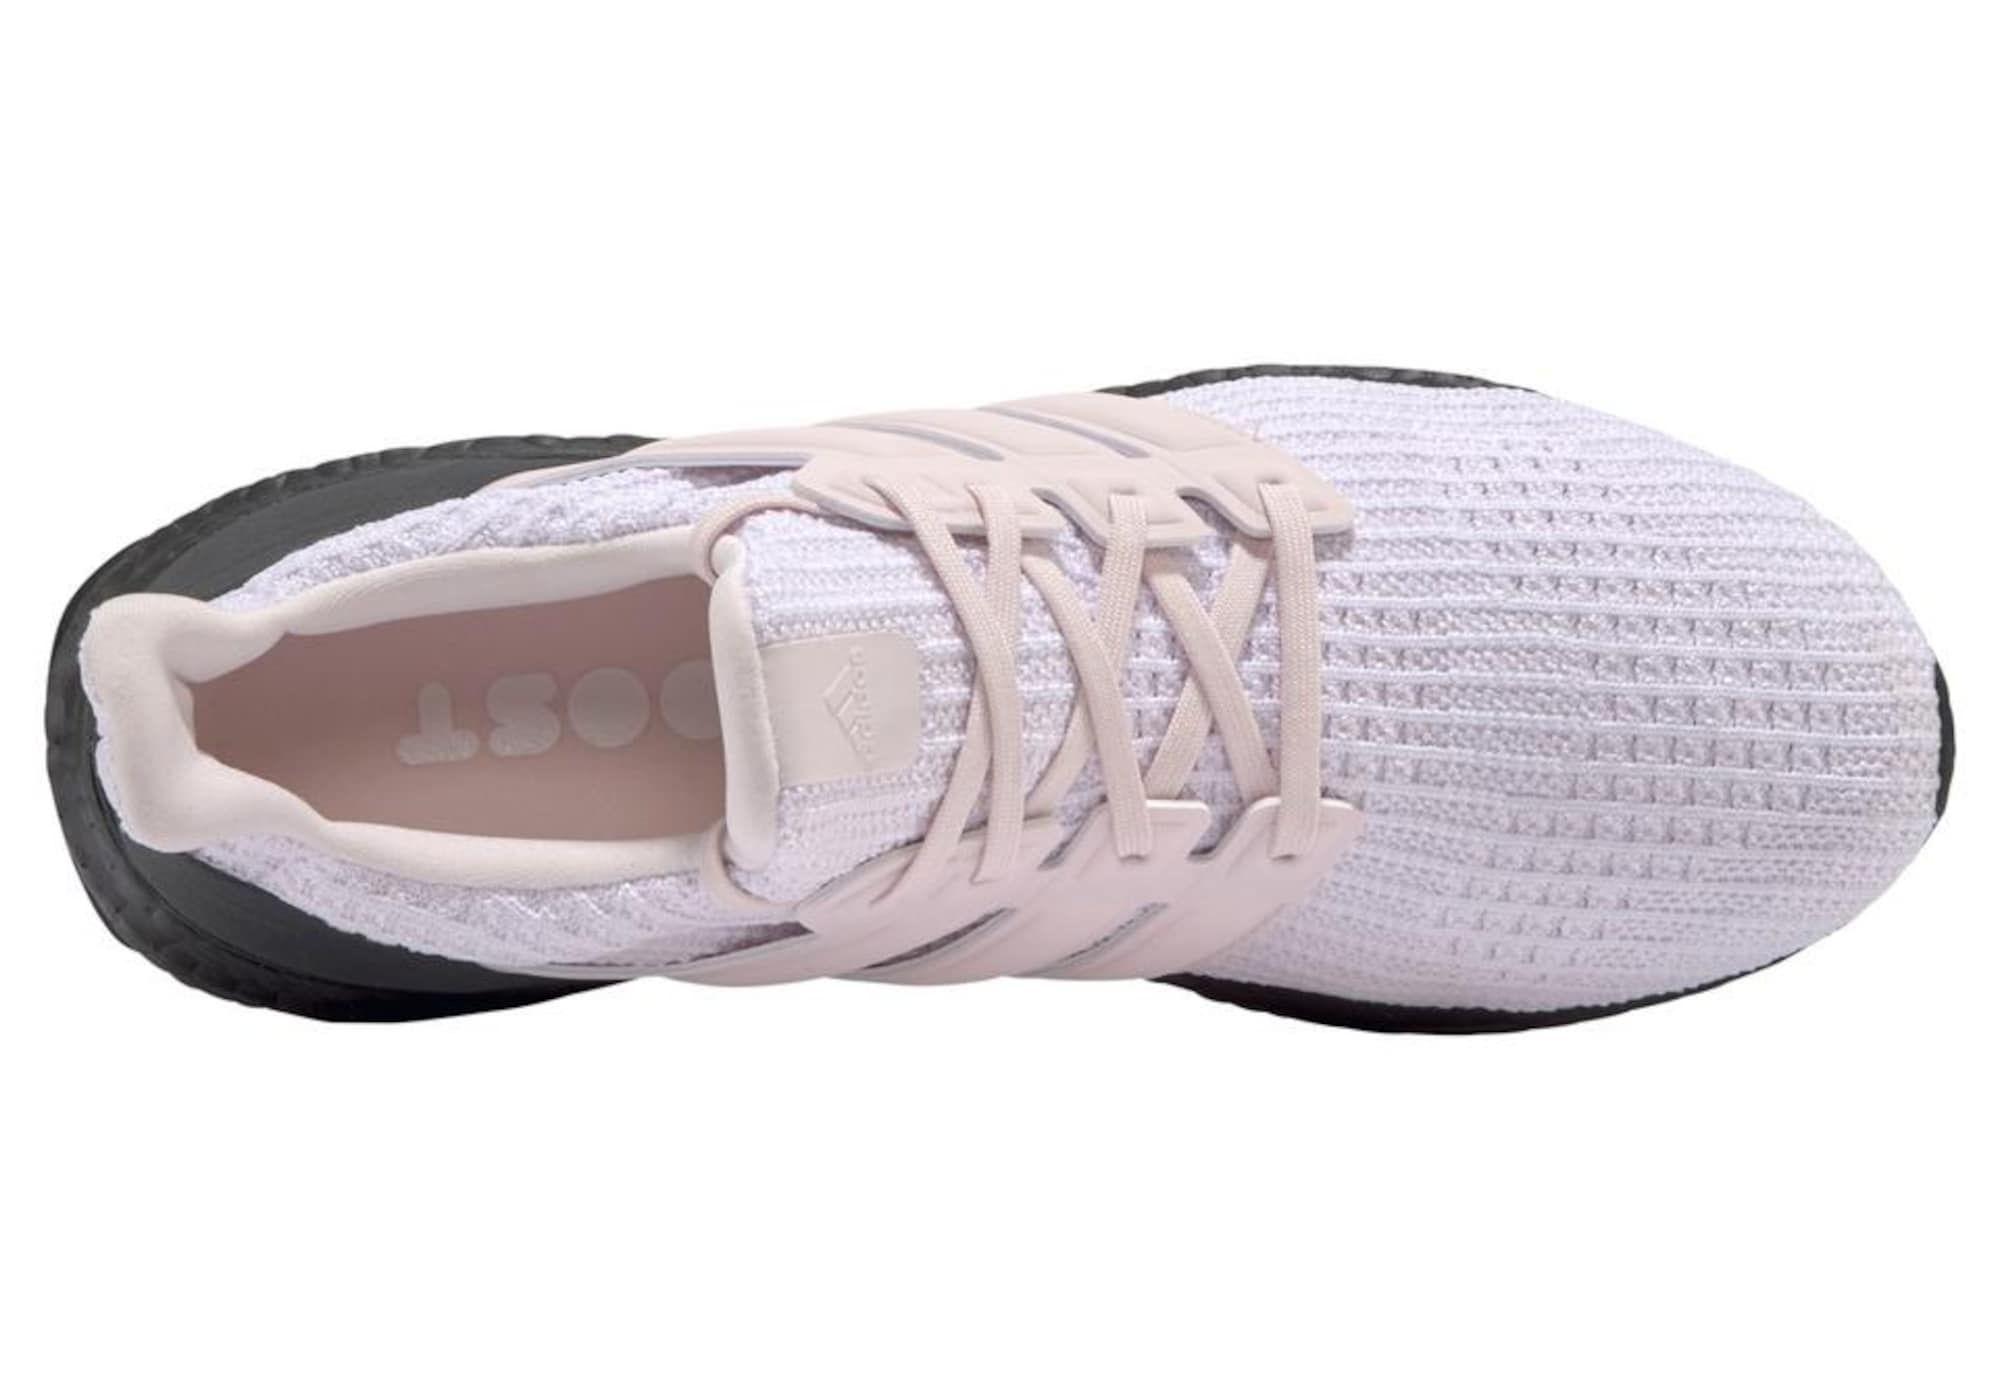 ADIDAS PERFORMANCE Sneaker 'Ultra Boost W Orchid Tint' Damen